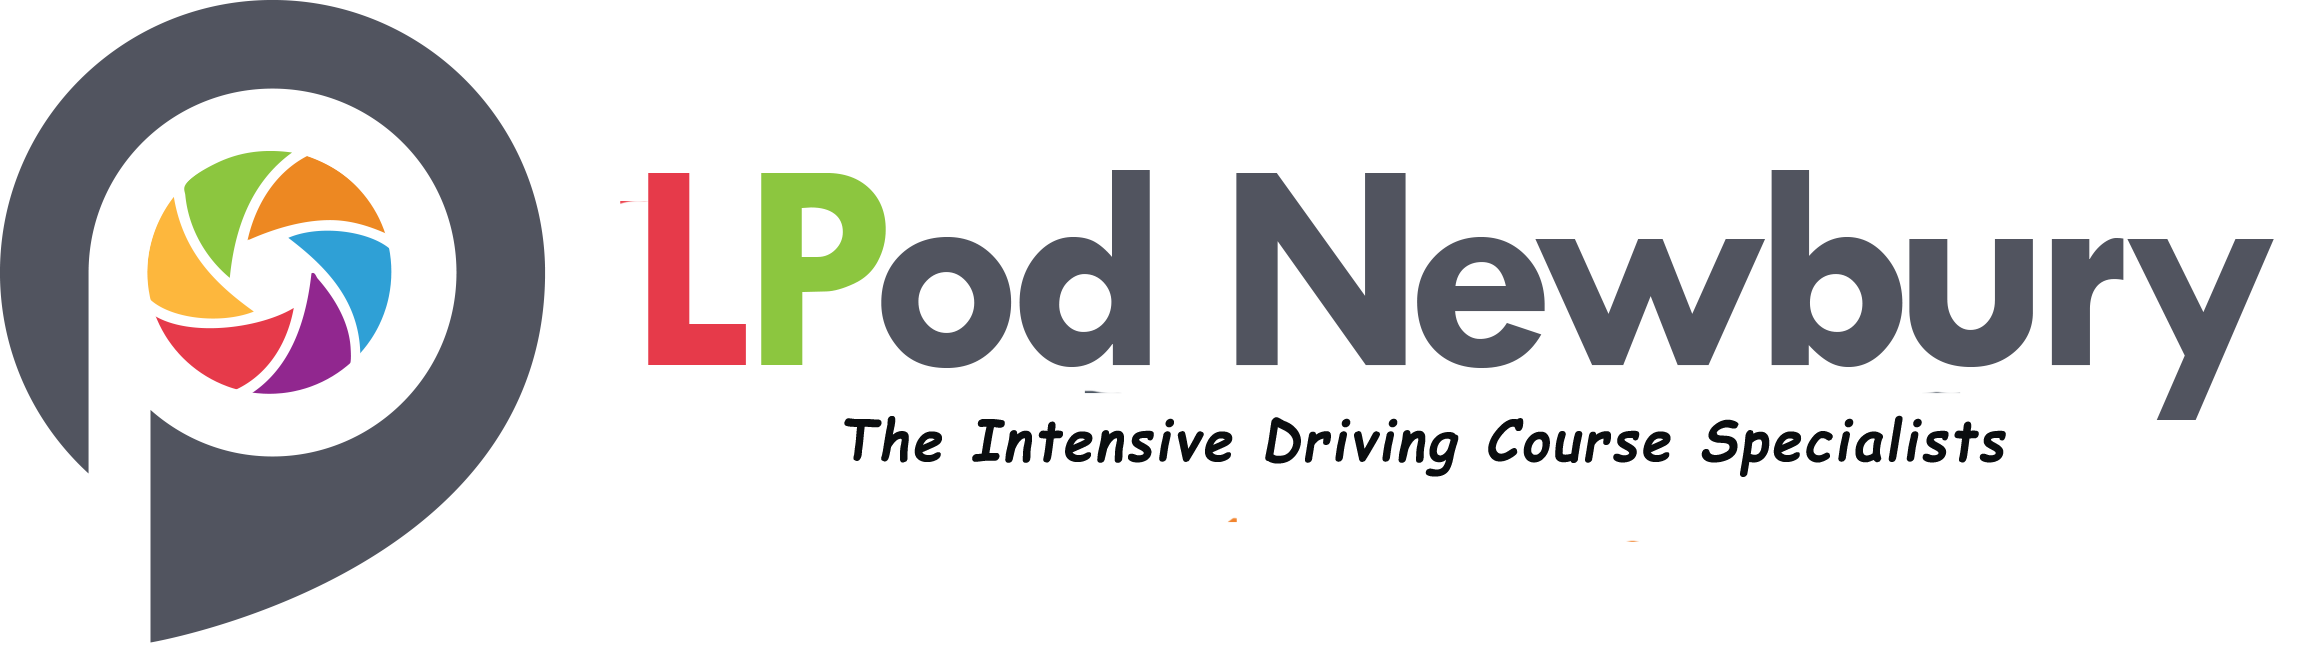 intensive driving courses newbury, intensive driving school newbury, intensive driving lessons newbury